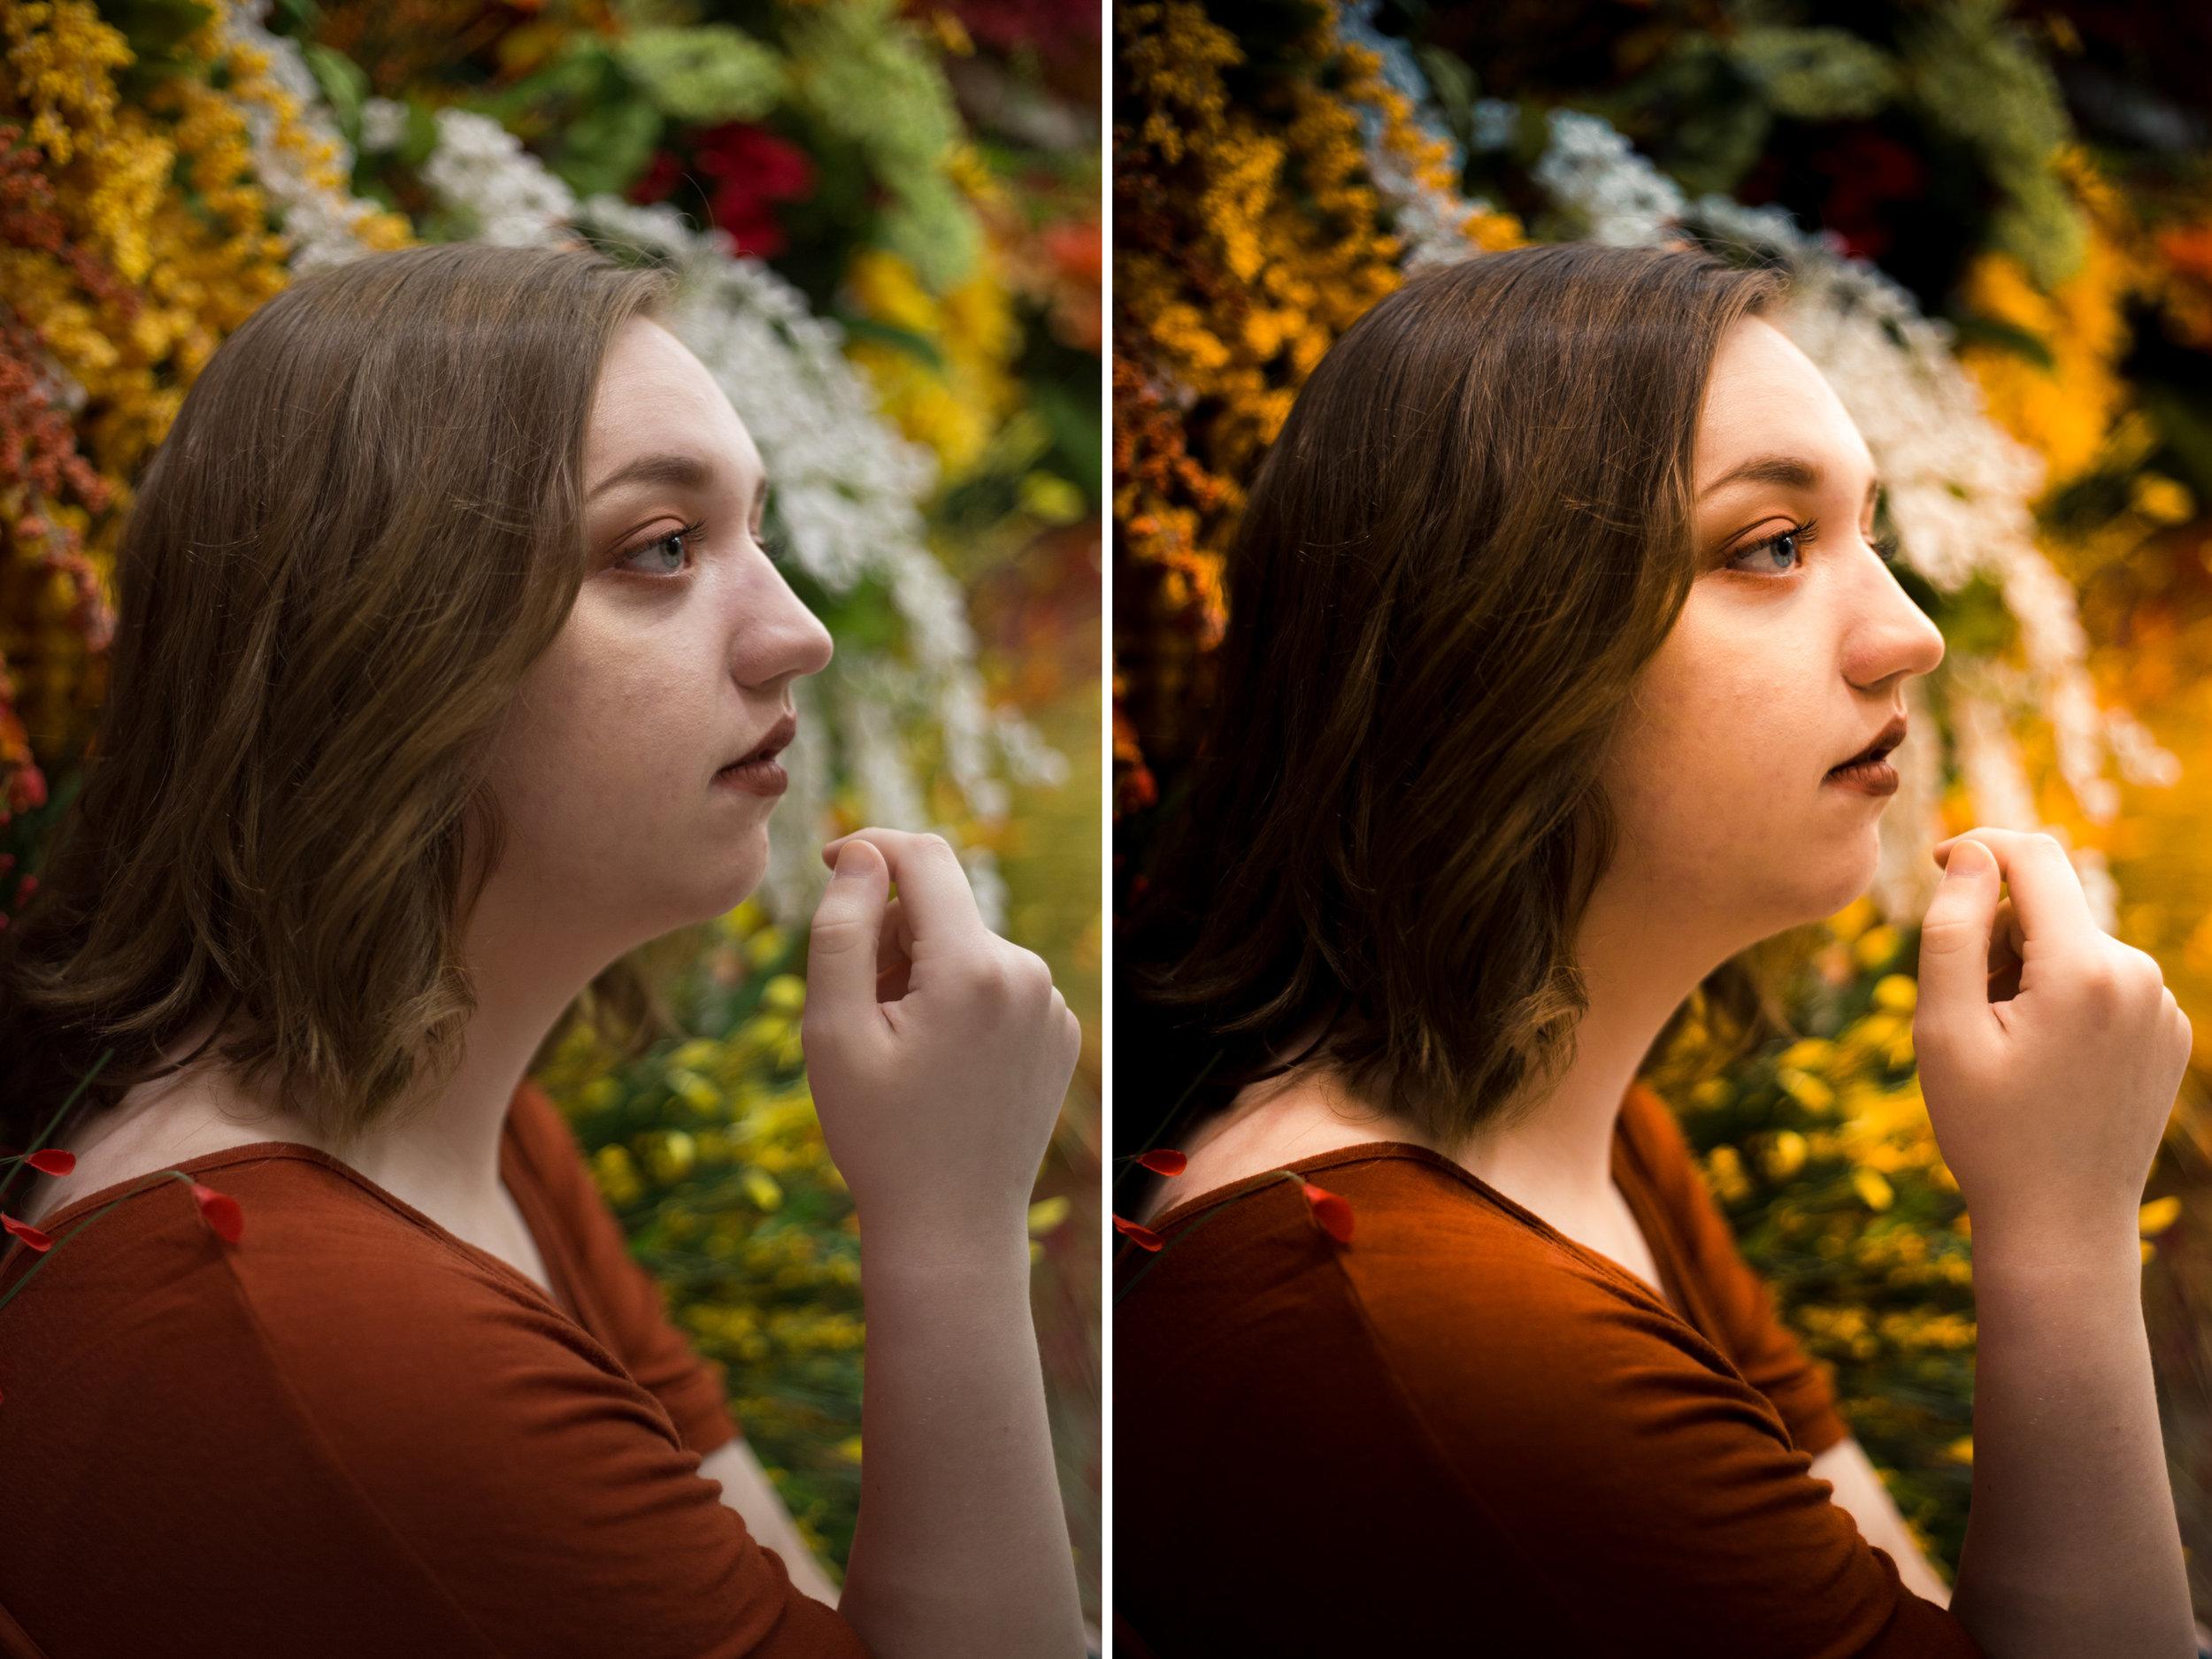 Left: Before / Right: Presets Used: All-In-One - Sunset Portrait2. Brushes Used: Face - Reduce Shadow Under Eyes, Face - Skin Tone & Smooth (tweaked), Eyes - Whiten Eyes, Eyes - Enhance Blue Eyes